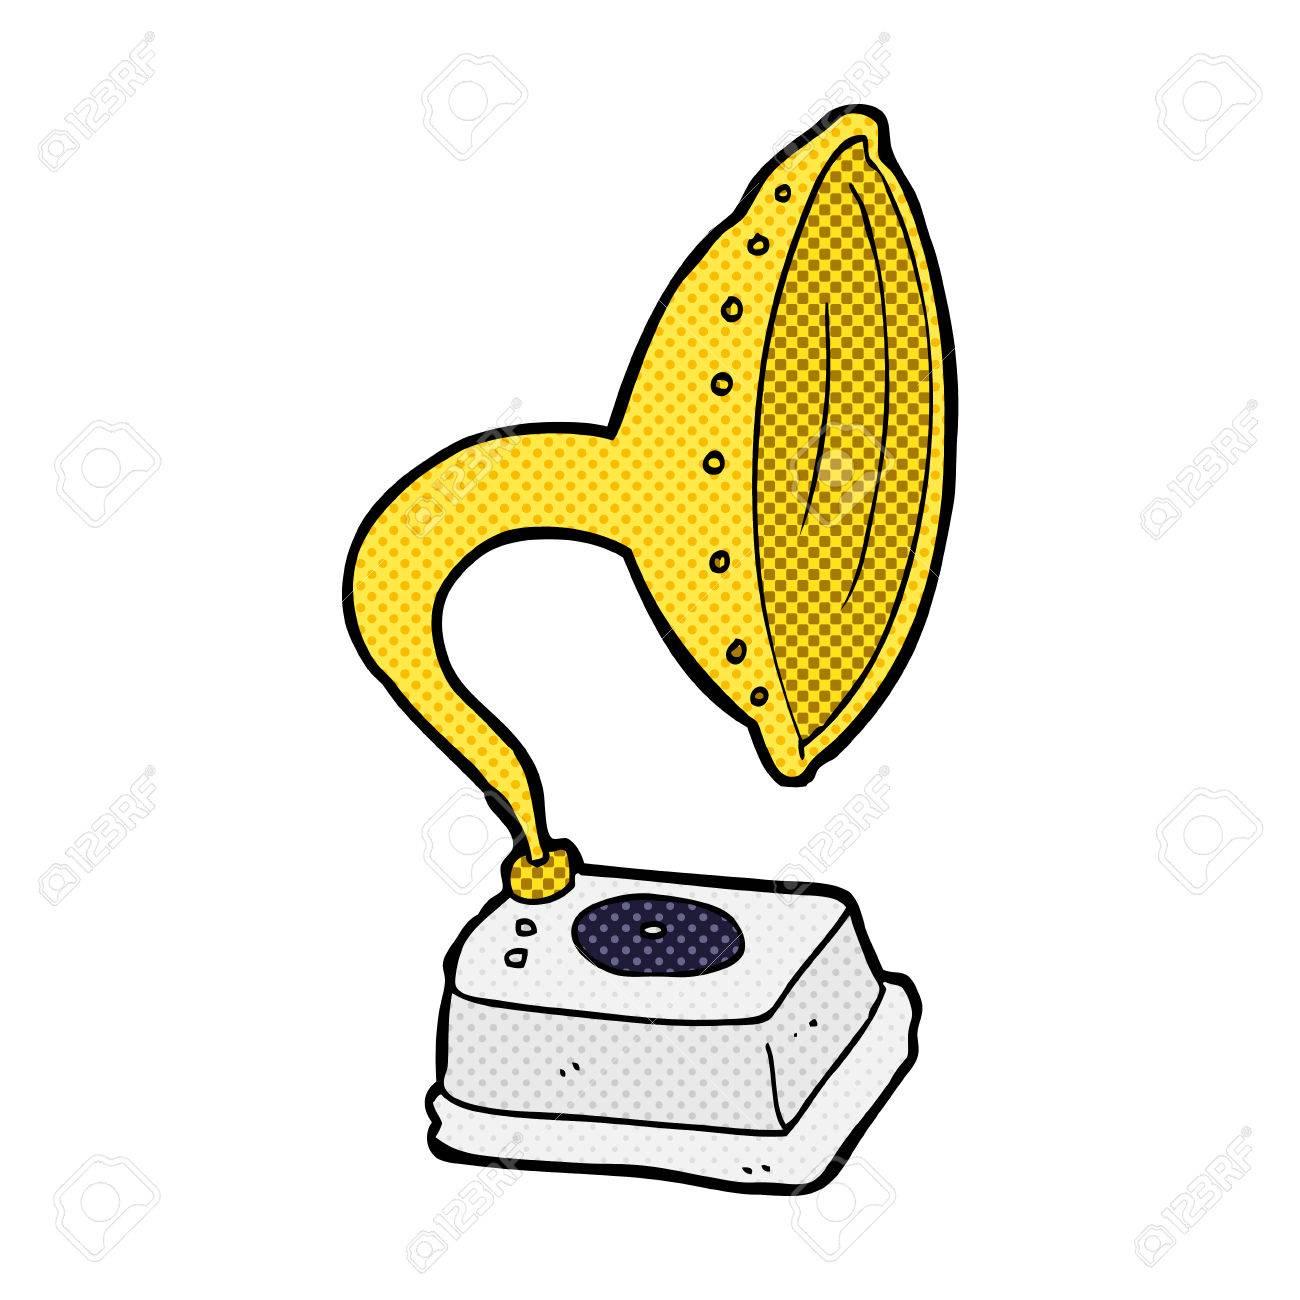 Retro Comic Book Style Cartoon Phonograph Royalty Free Cliparts ...